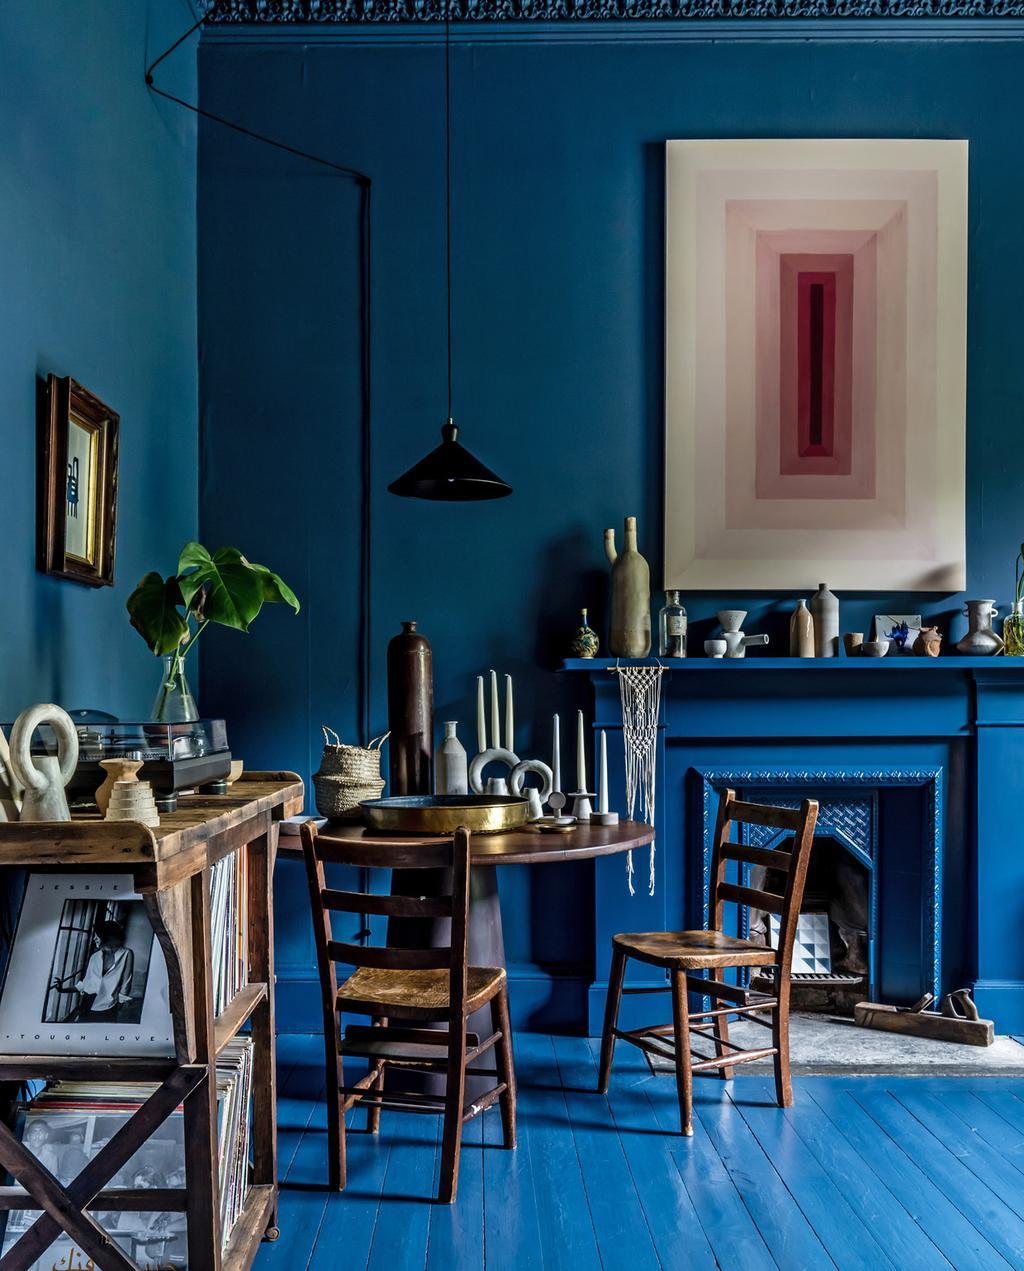 vtwonen | binnenkijken | Edinburgh | eethoek